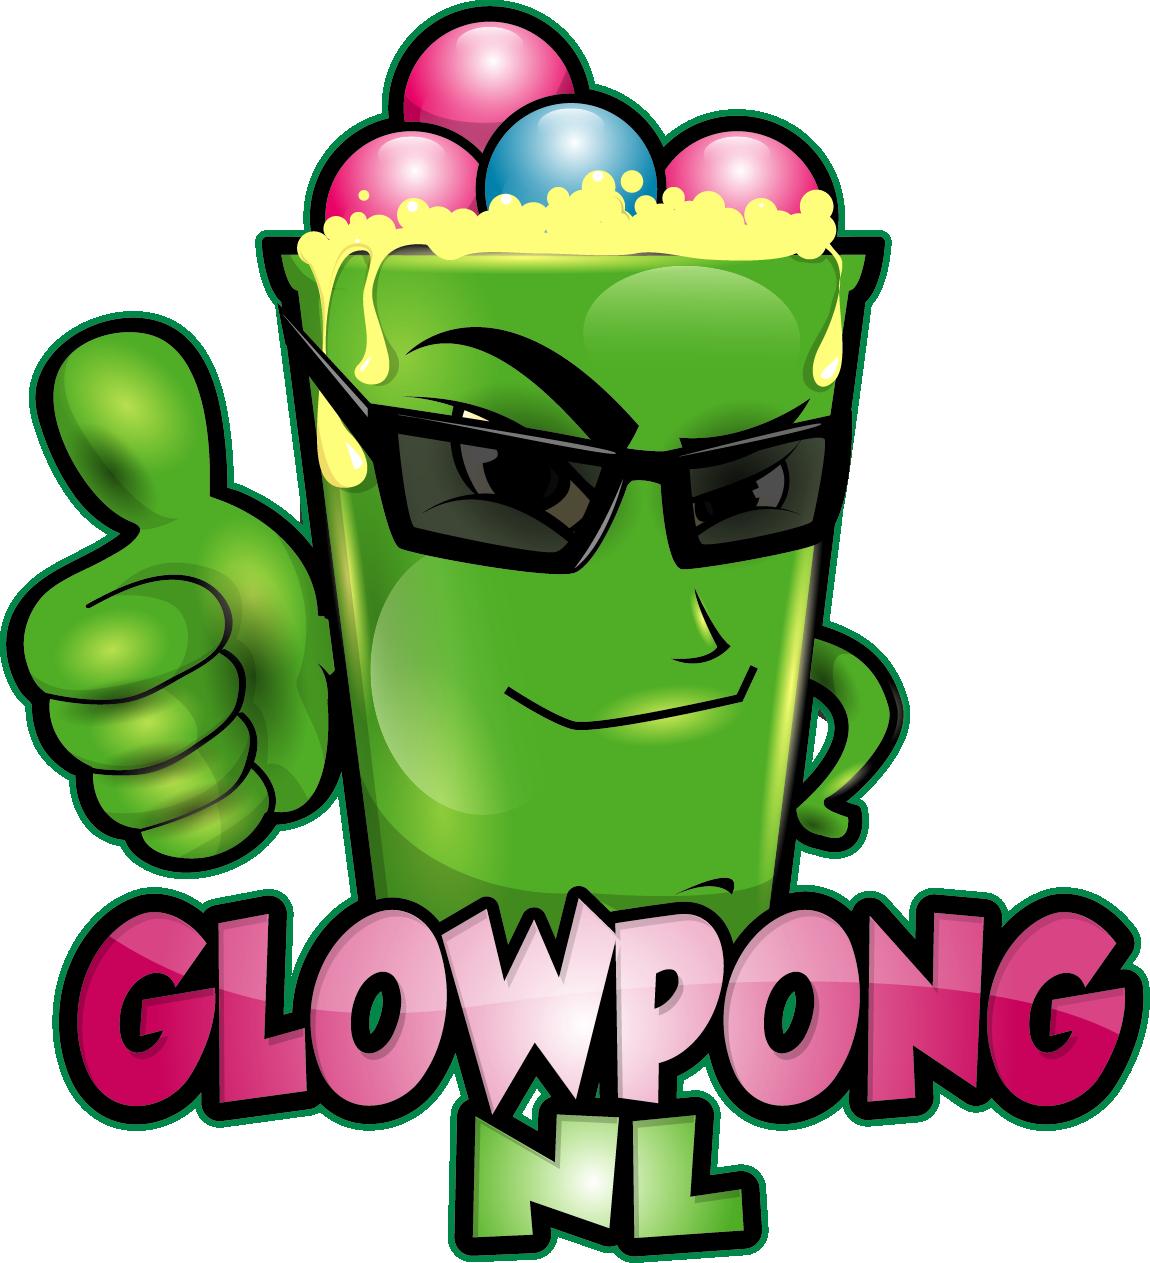 Glowpong